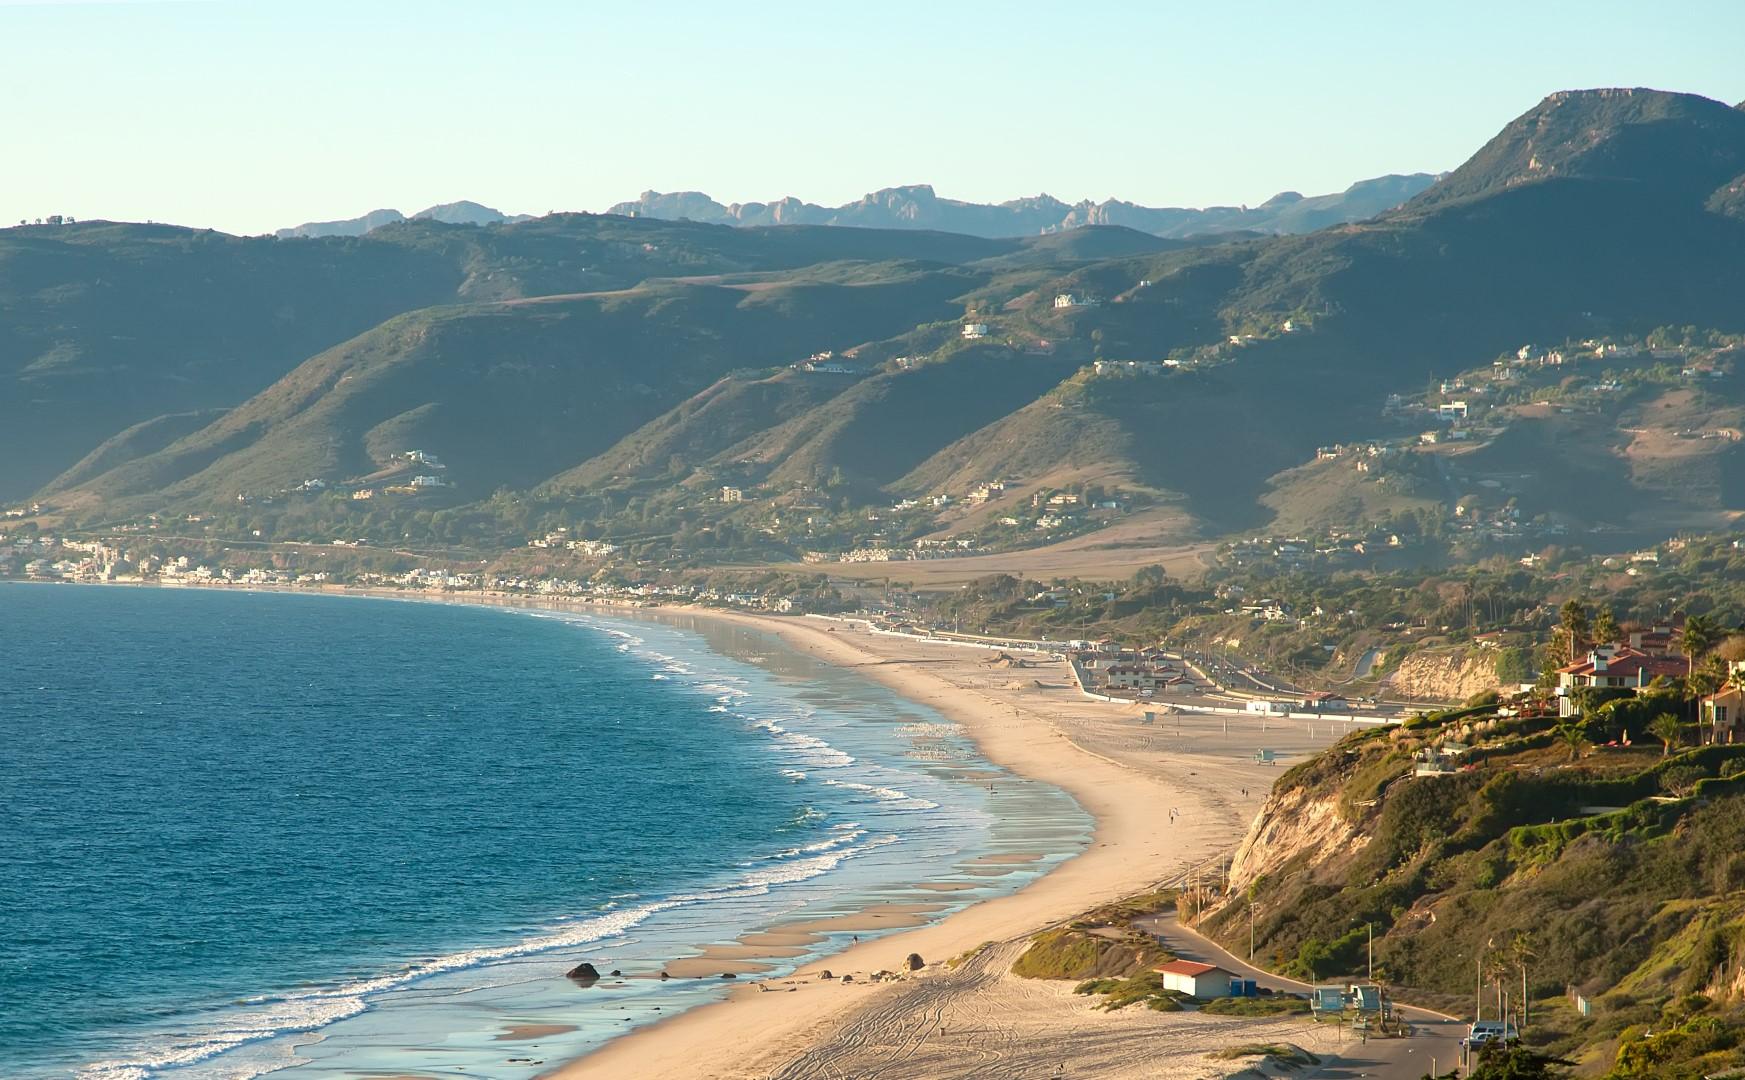 bigs-Point-Dume-View-of-Zuma-Beach-and-Mountains-malibu-ca-Large.jpg